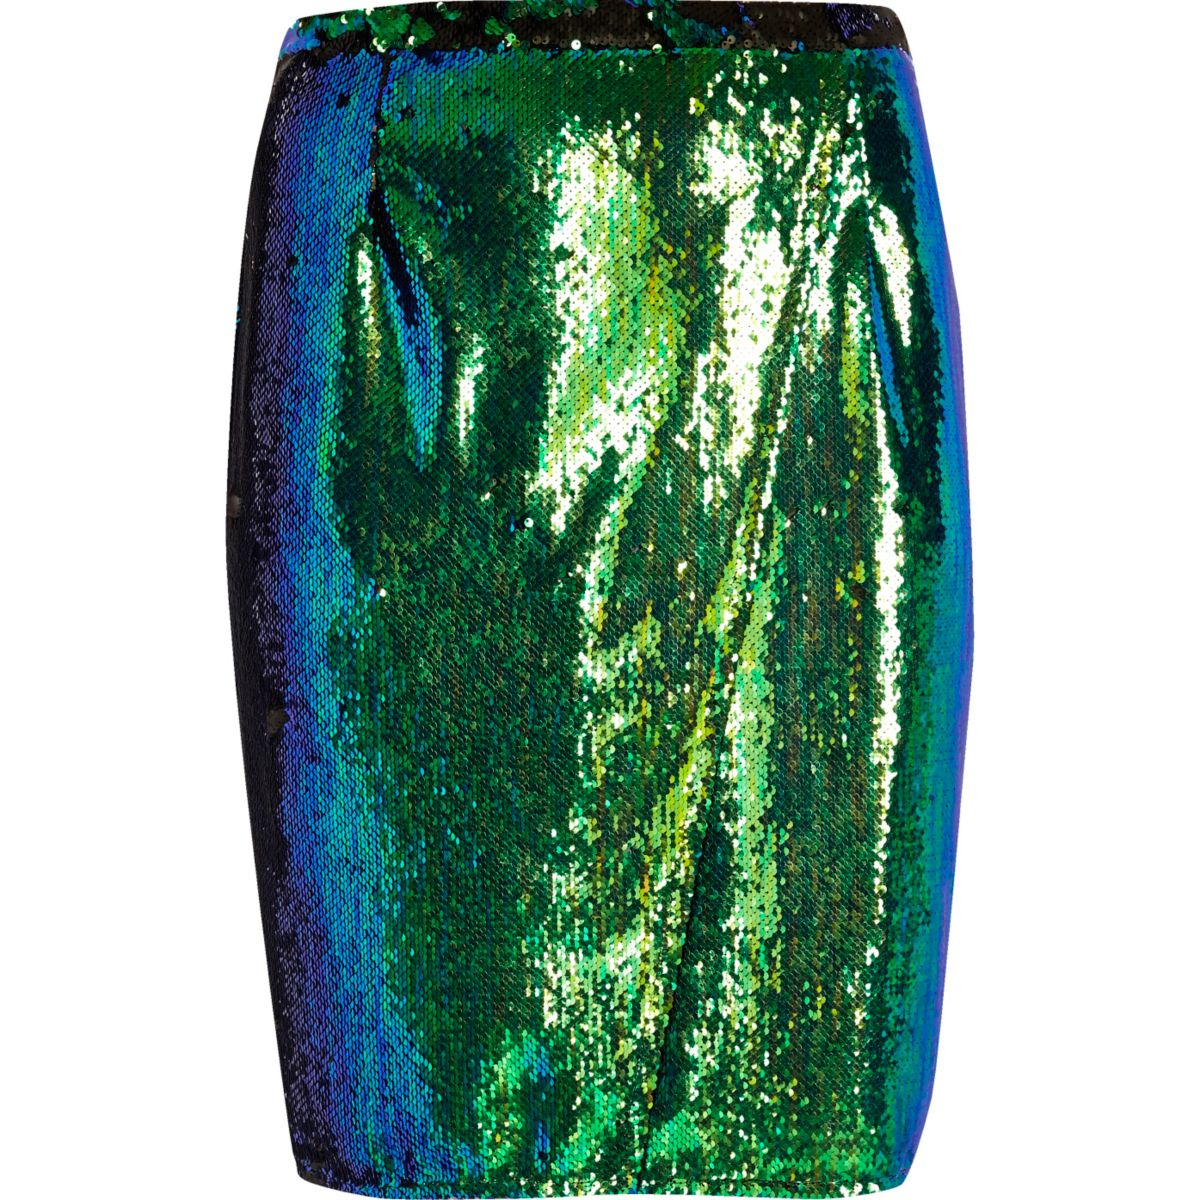 Plus emerald green sequin pencil skirt